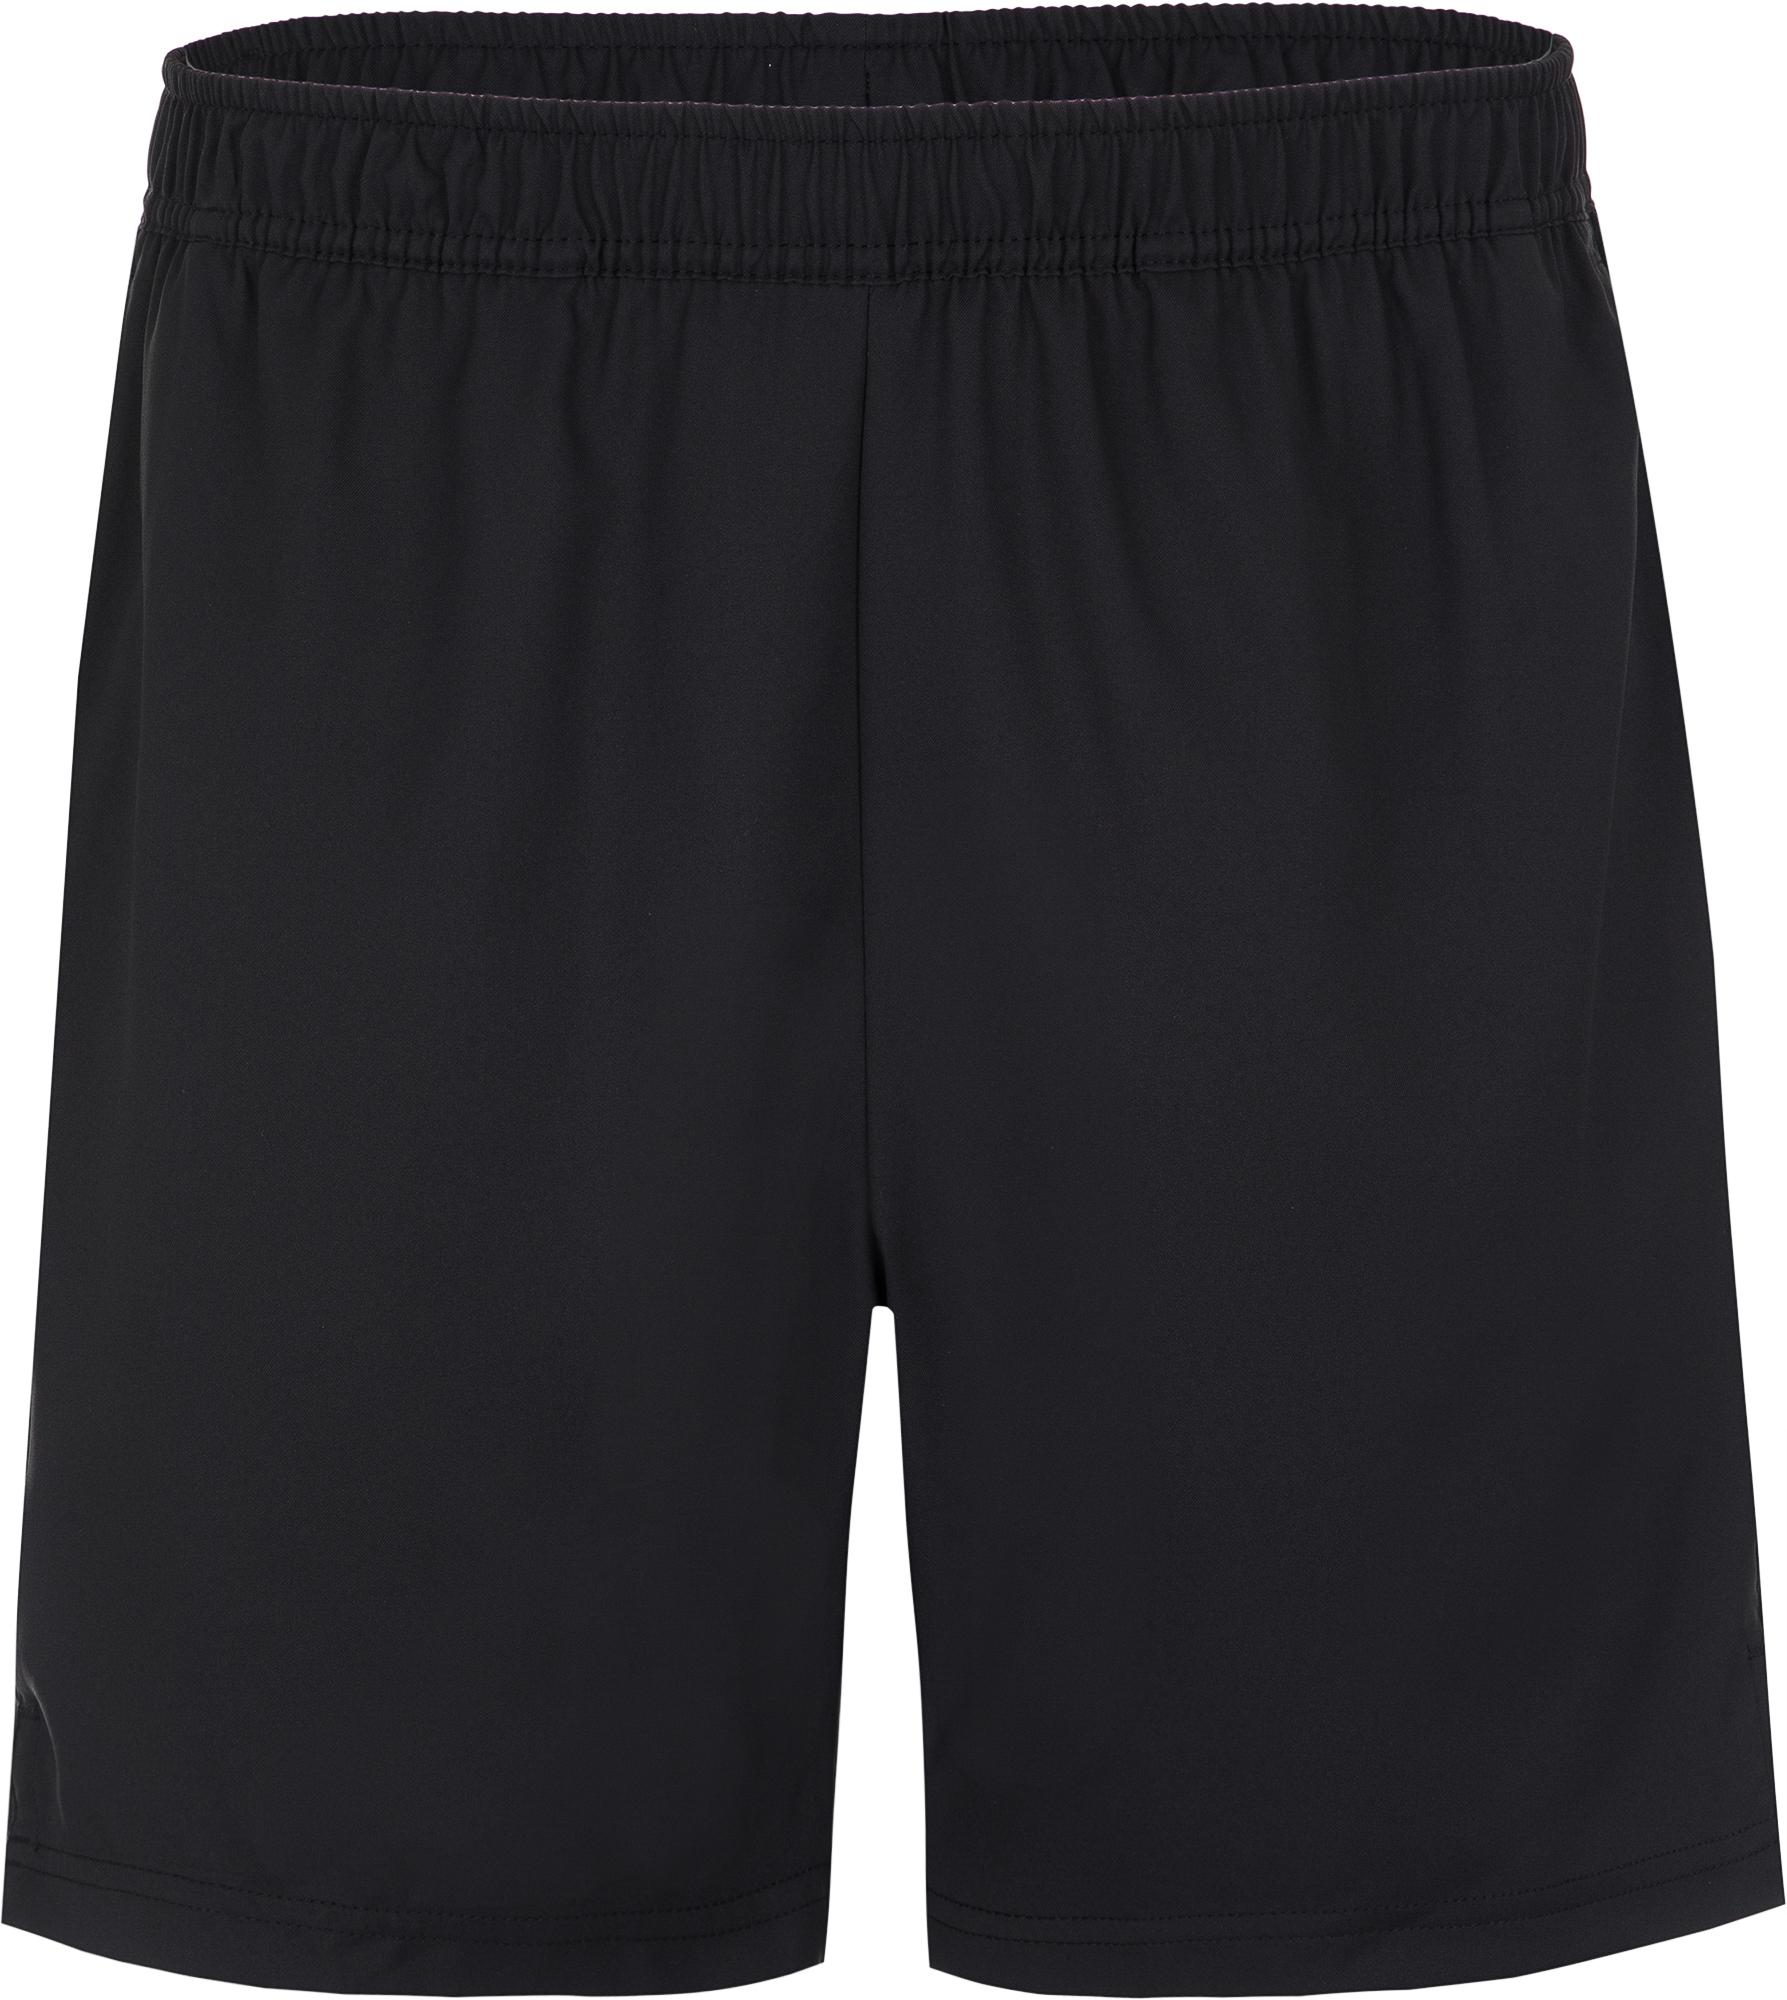 Nike Шорты мужские Nike Dry, размер 44-46 nike боксерки мужские nike machomai размер 44